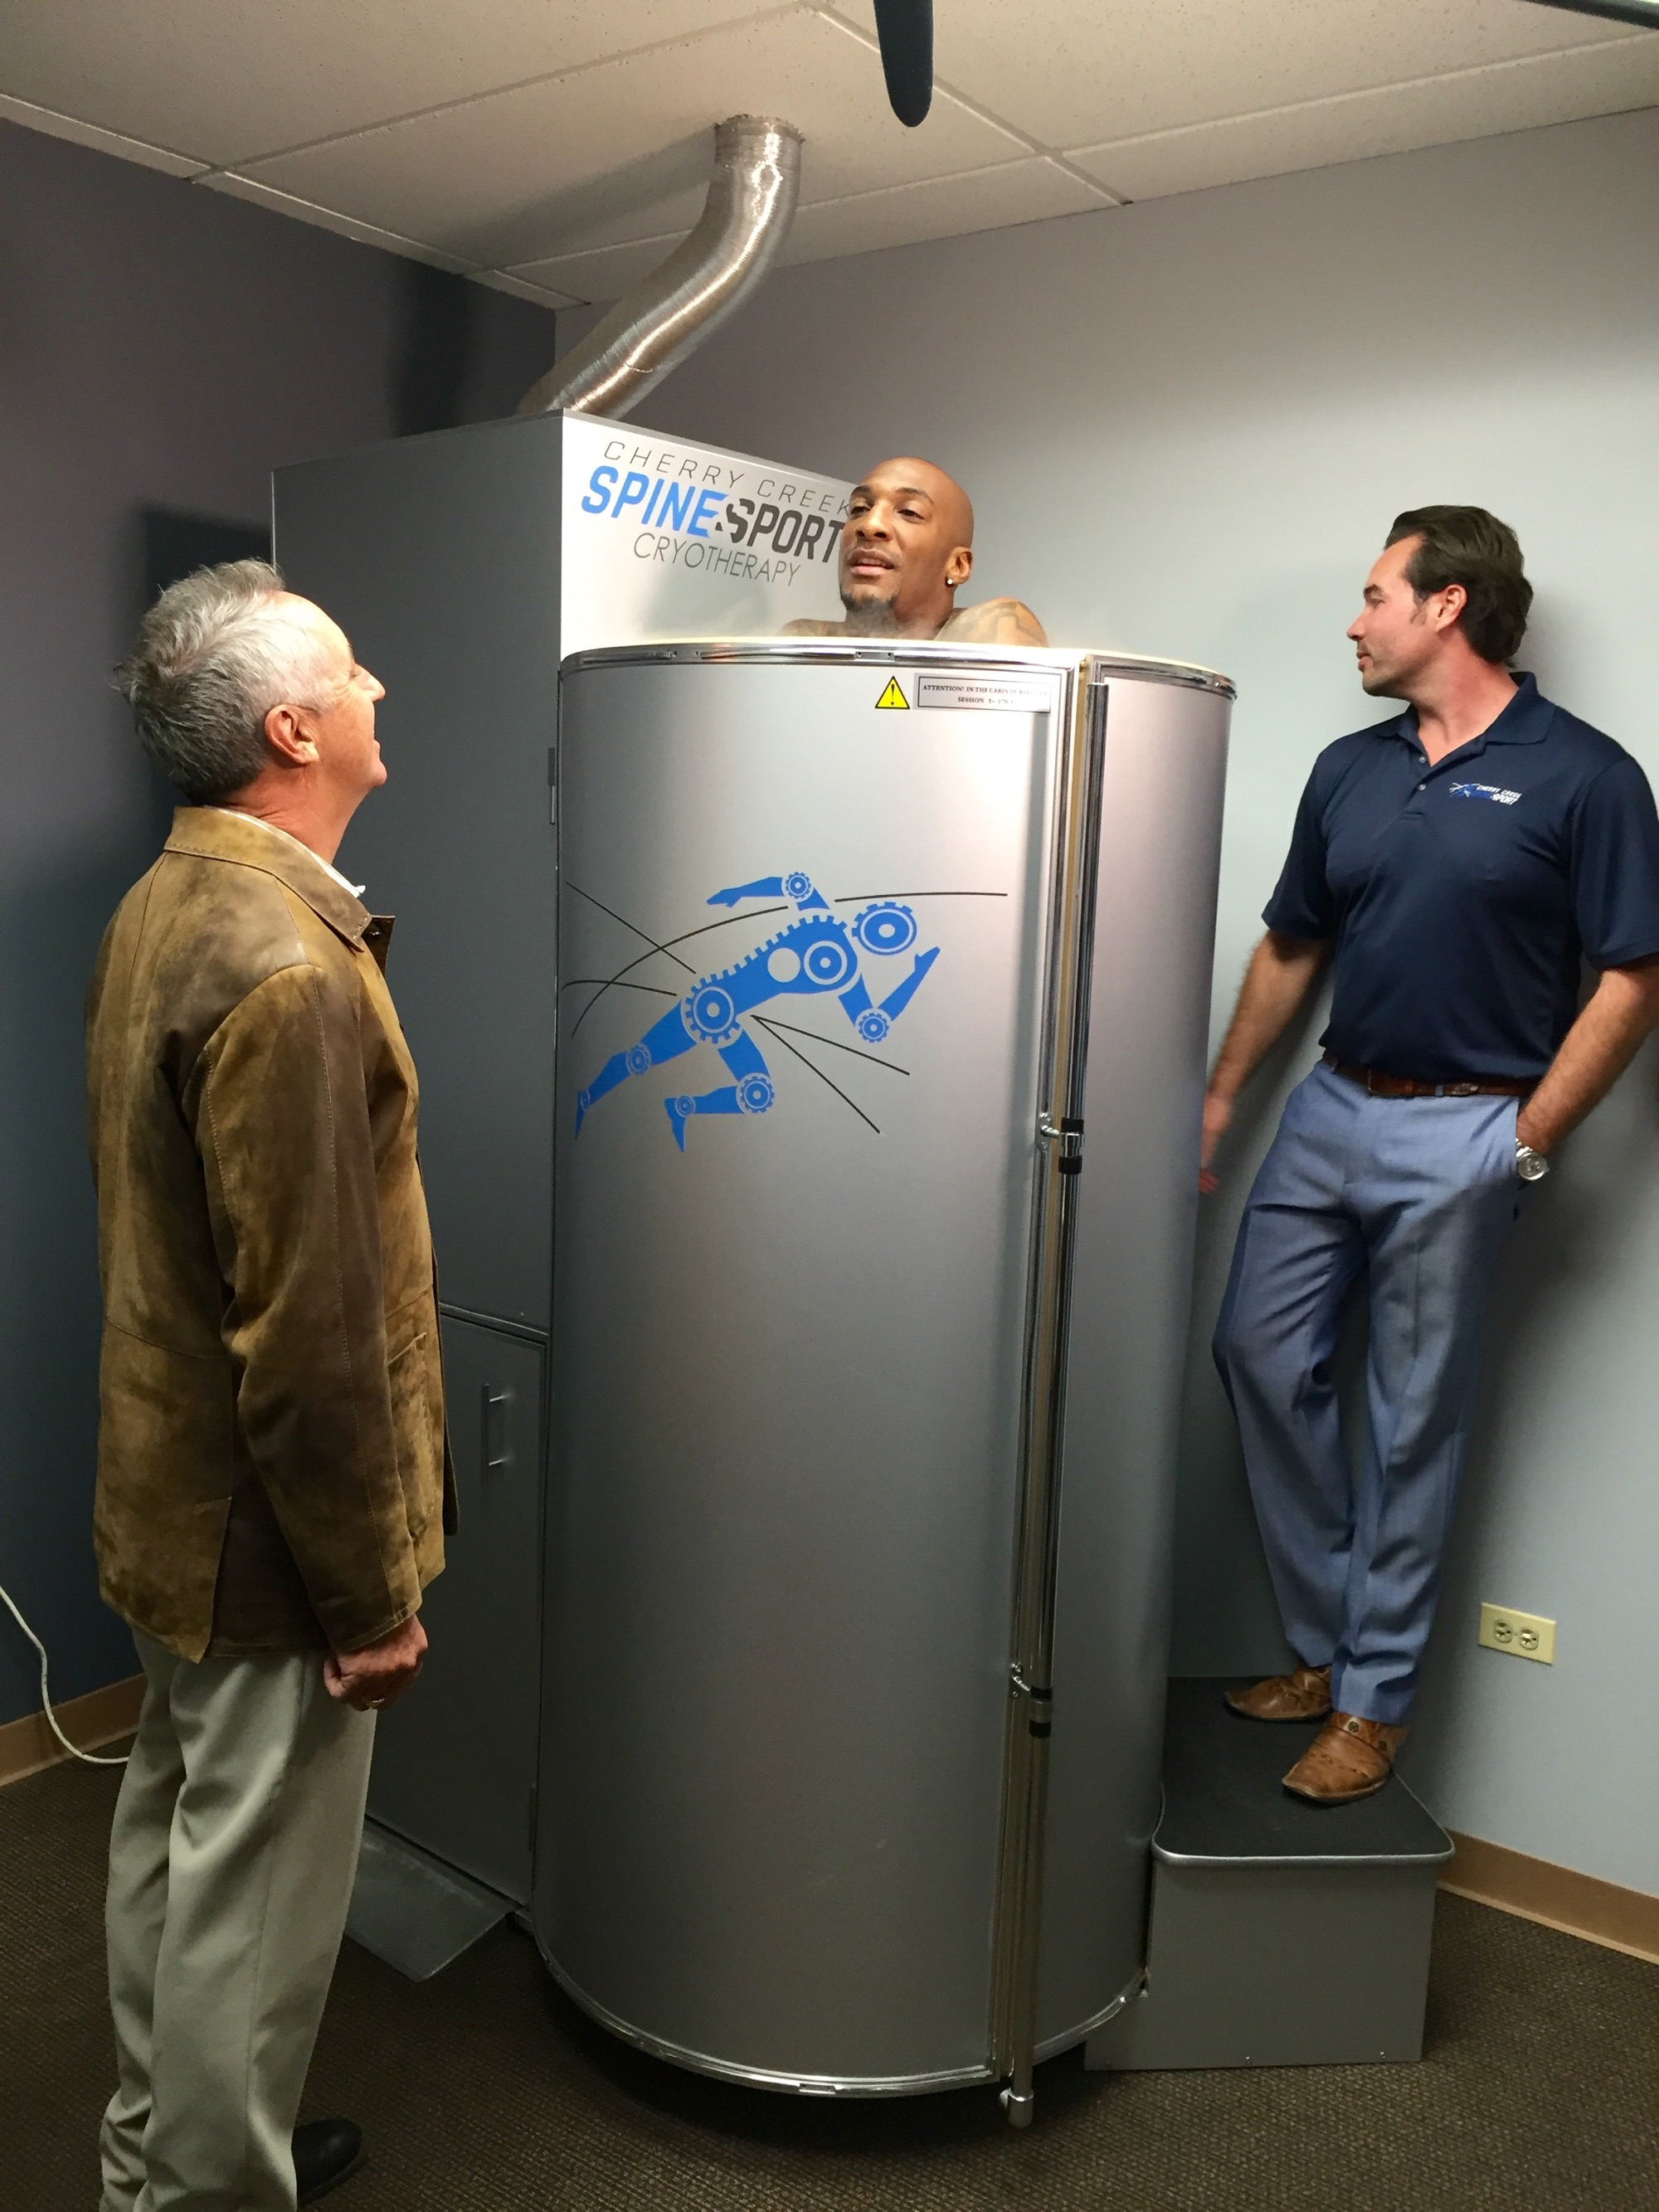 Aqib Talib in Cryotherapy Sauna